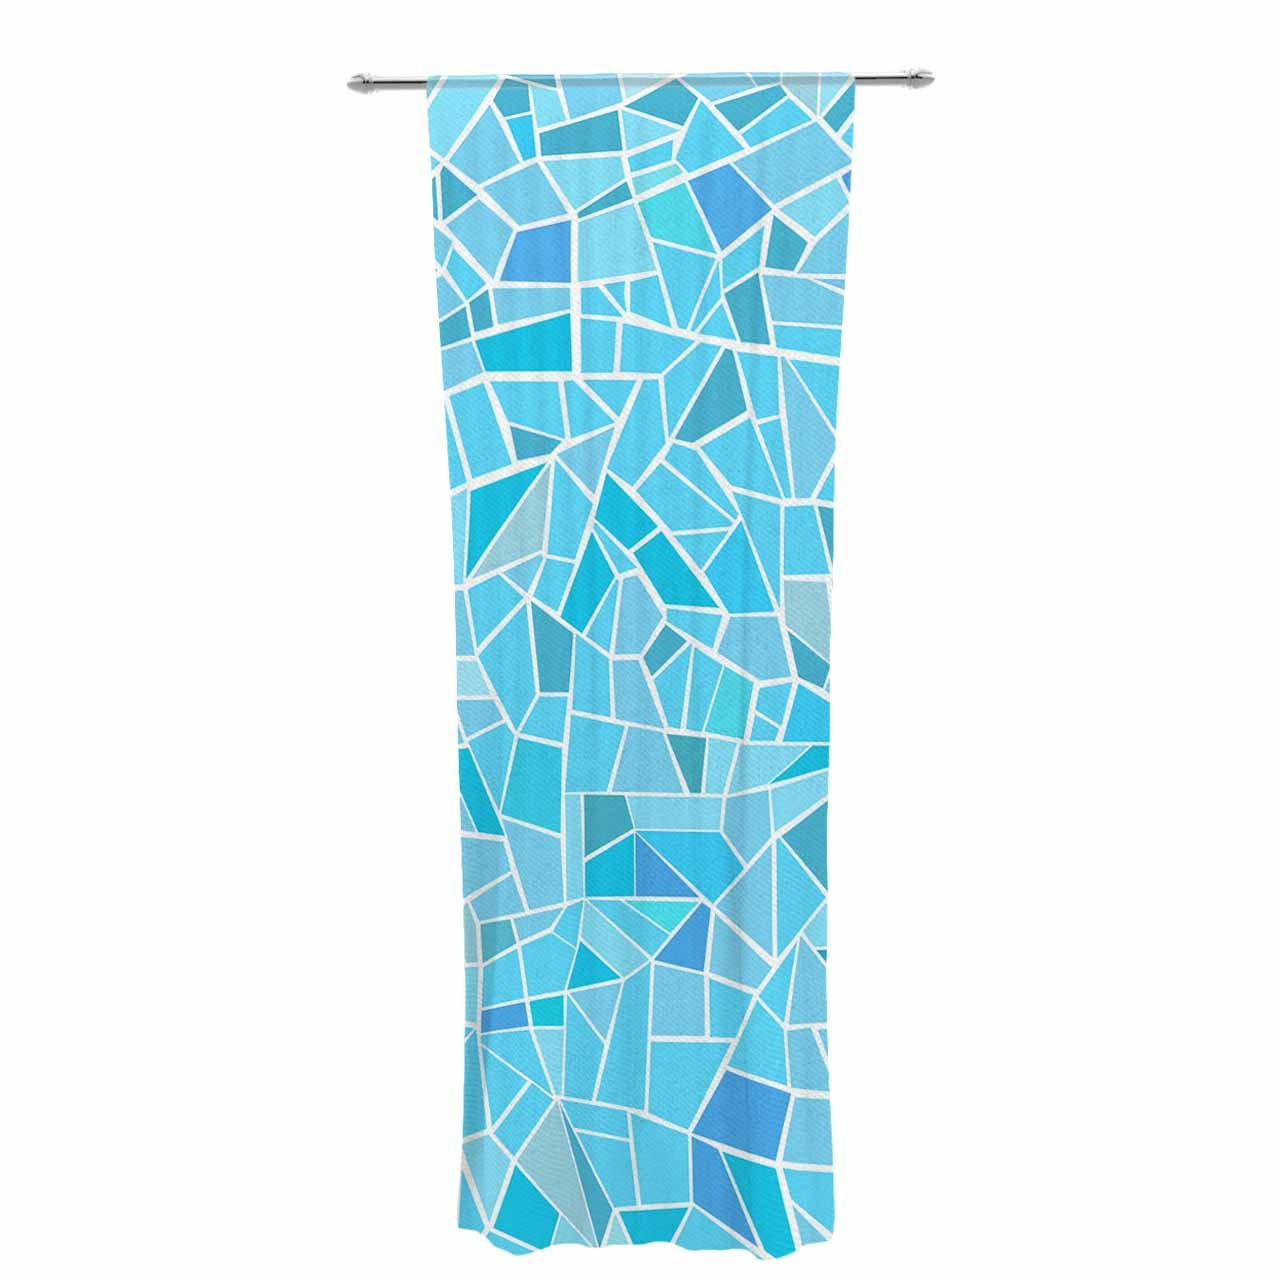 Kess InHouse afe Images Abstract Mosaic Pattern Blue Pastel Illustration Decorative Set, 30' x 84' Sheer Curtains